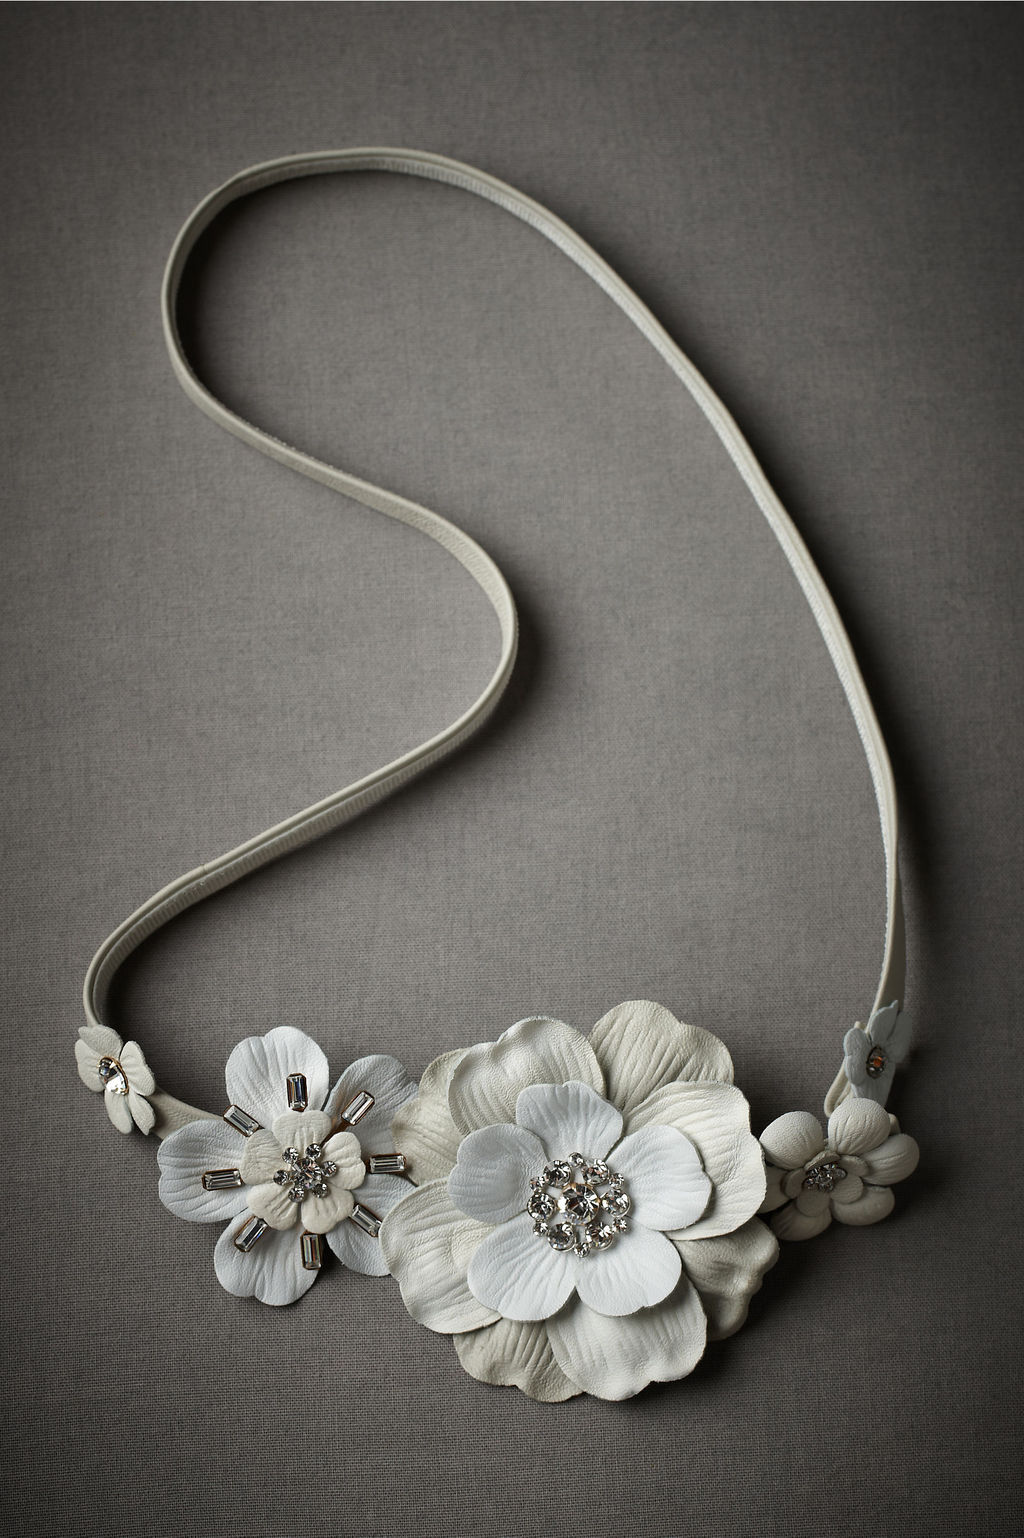 Bridal-belts-chic-wedding-accessories-bhldn-romantic.full